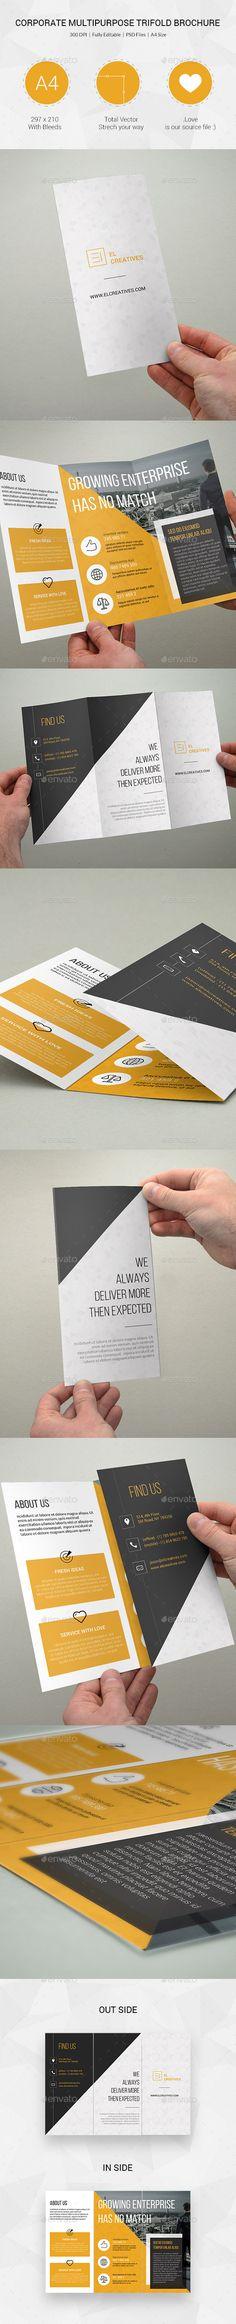 Corporate Multipurpose Trifold Brochure Template #printdesign #design Download: http://graphicriver.net/item/corporate-multipurpose-trifold-brochure-12/12071622?ref=ksioks